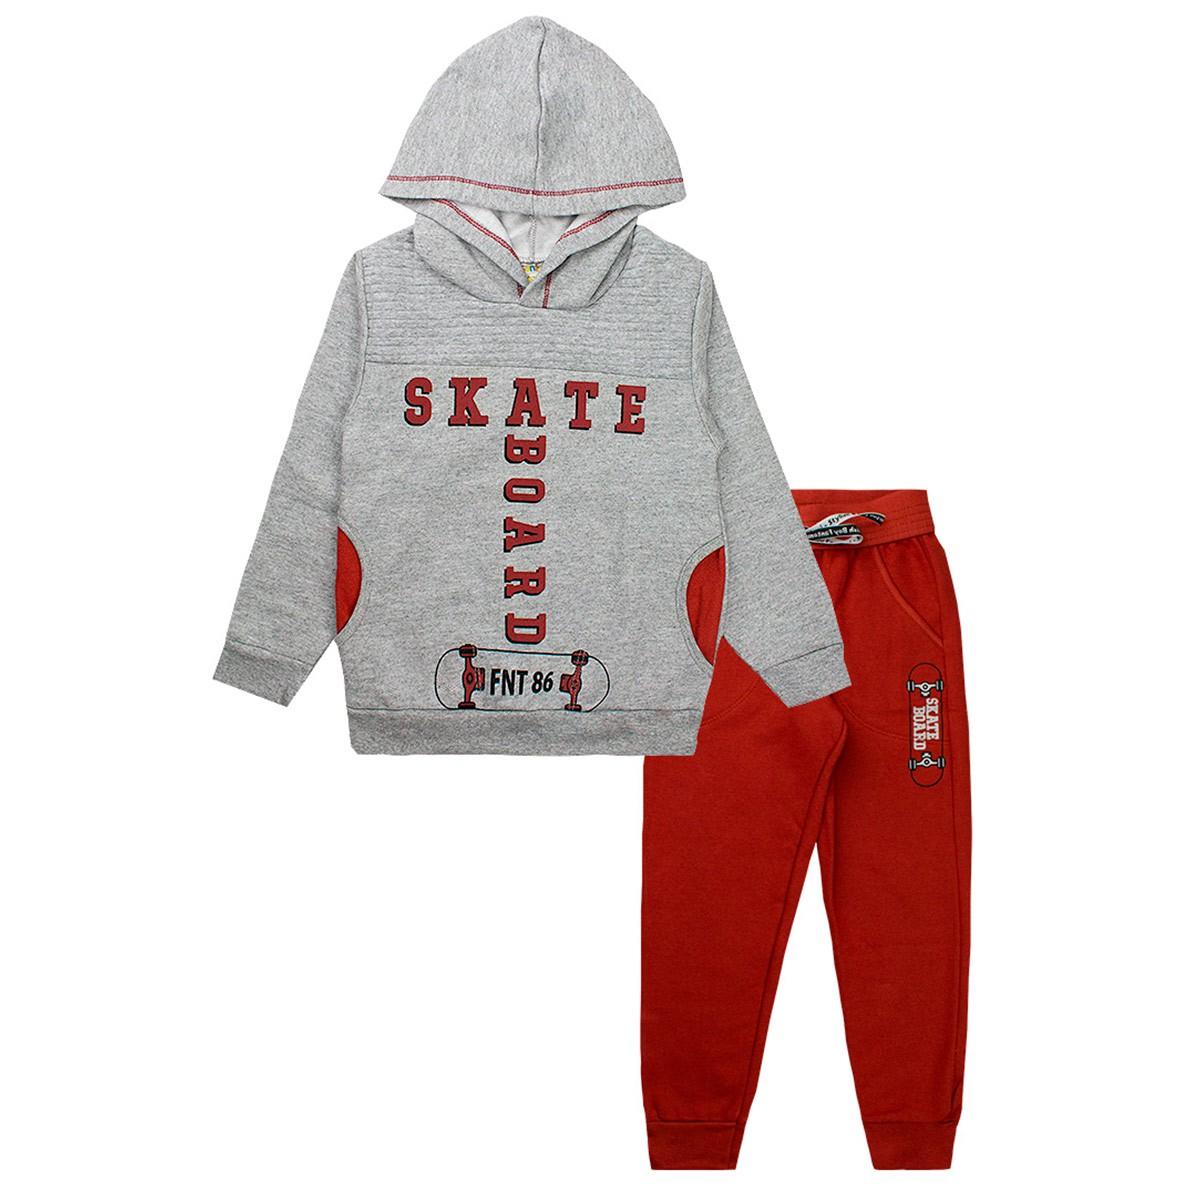 Conjunto De Moletom Infantil Masculino Skate Board Mescla